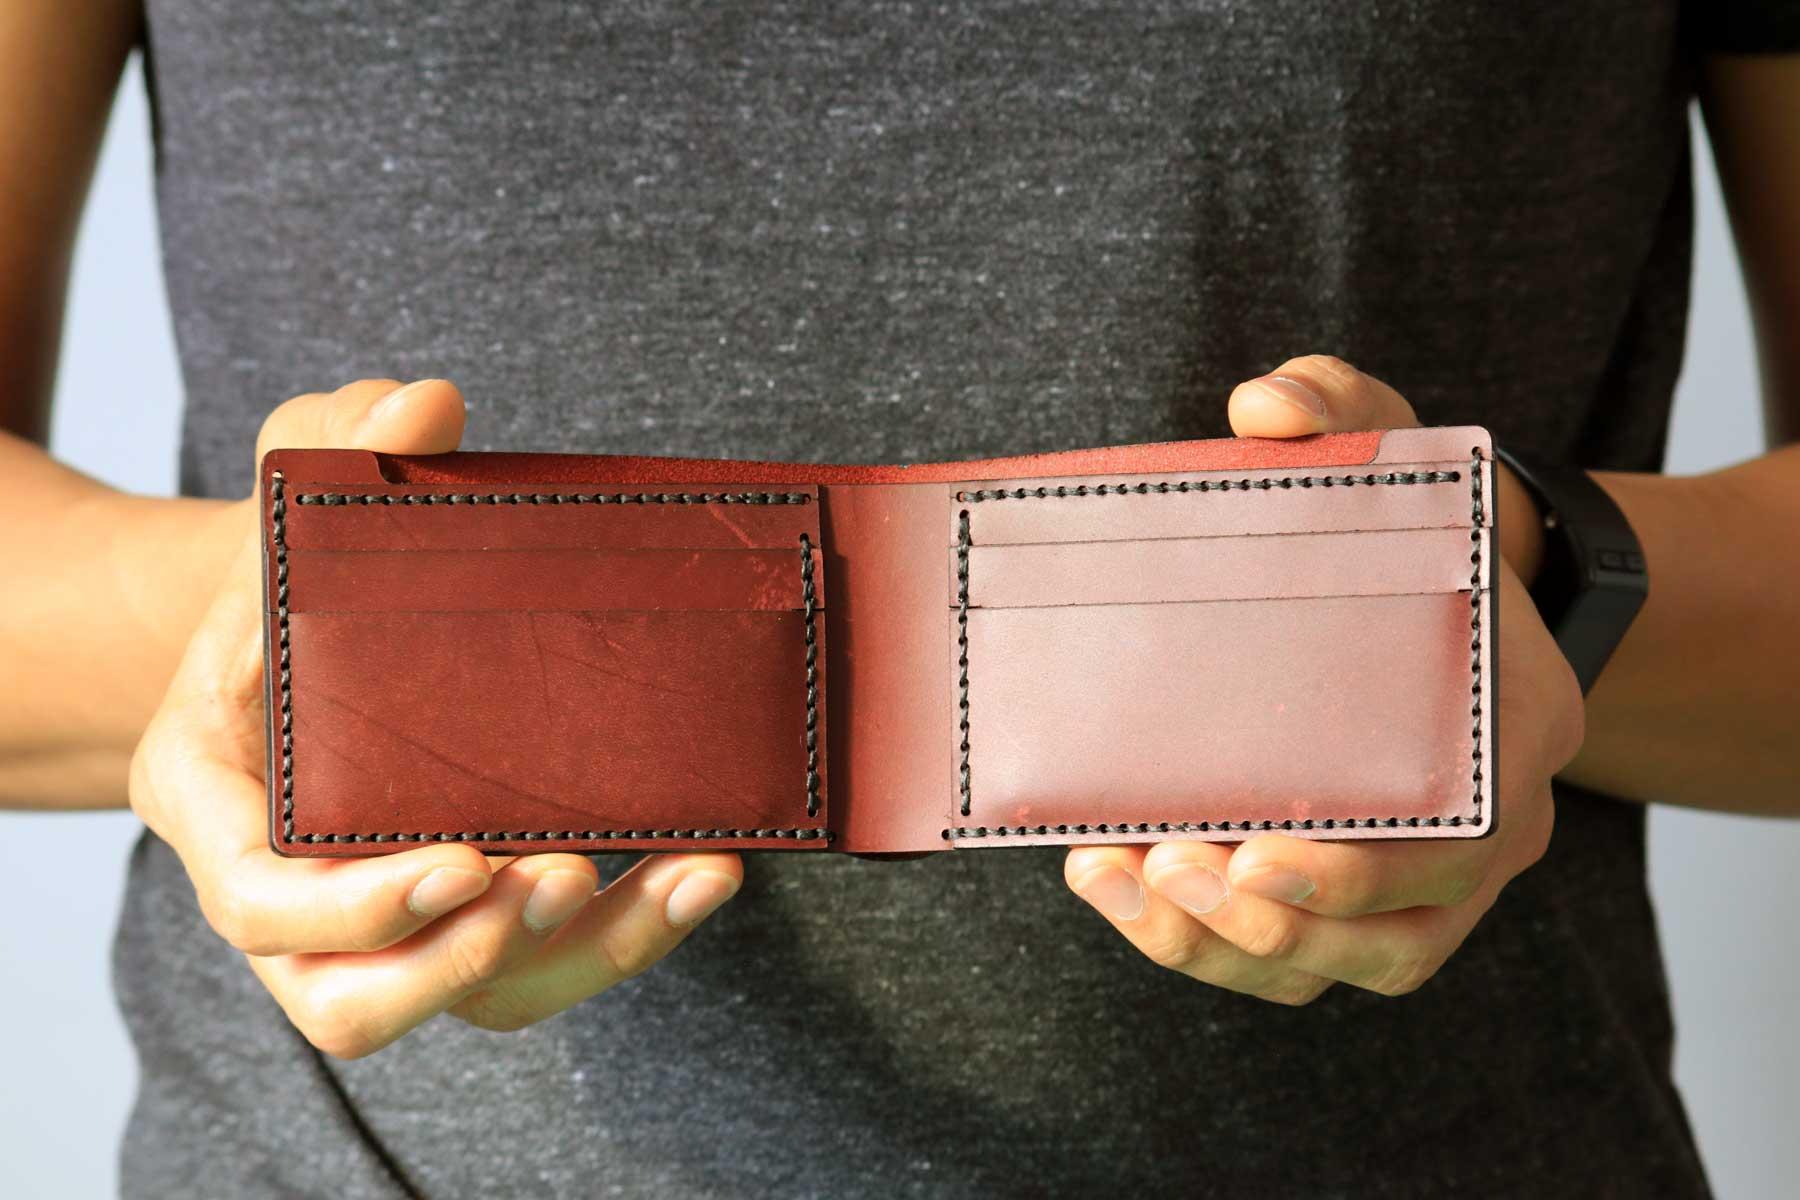 09_Bifold-Wallet-01.jpg